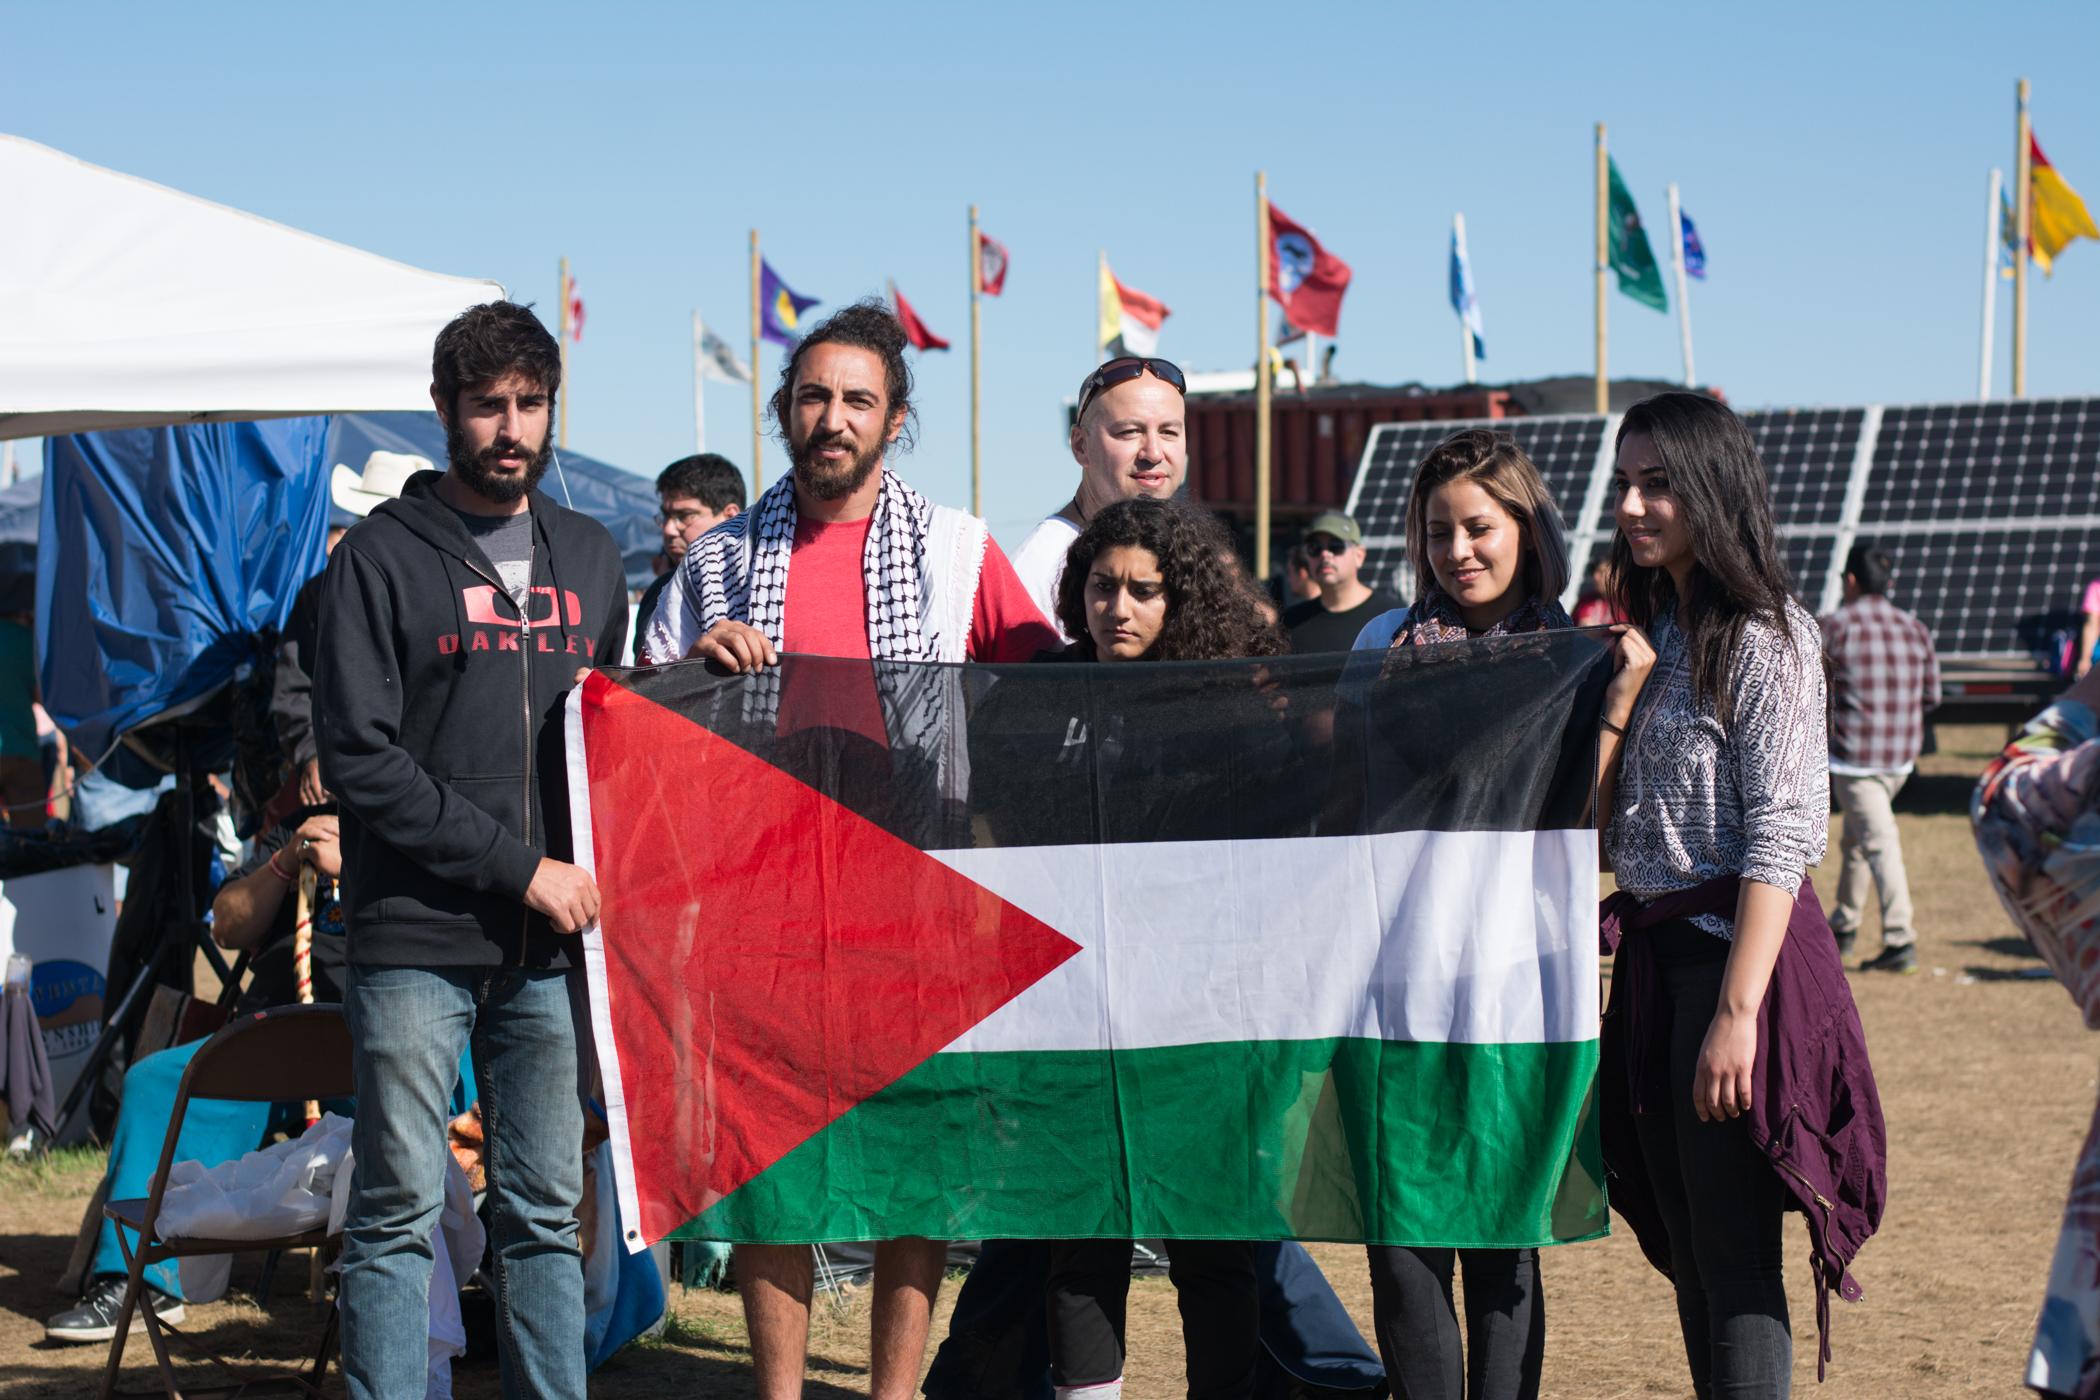 Representing Palestine.